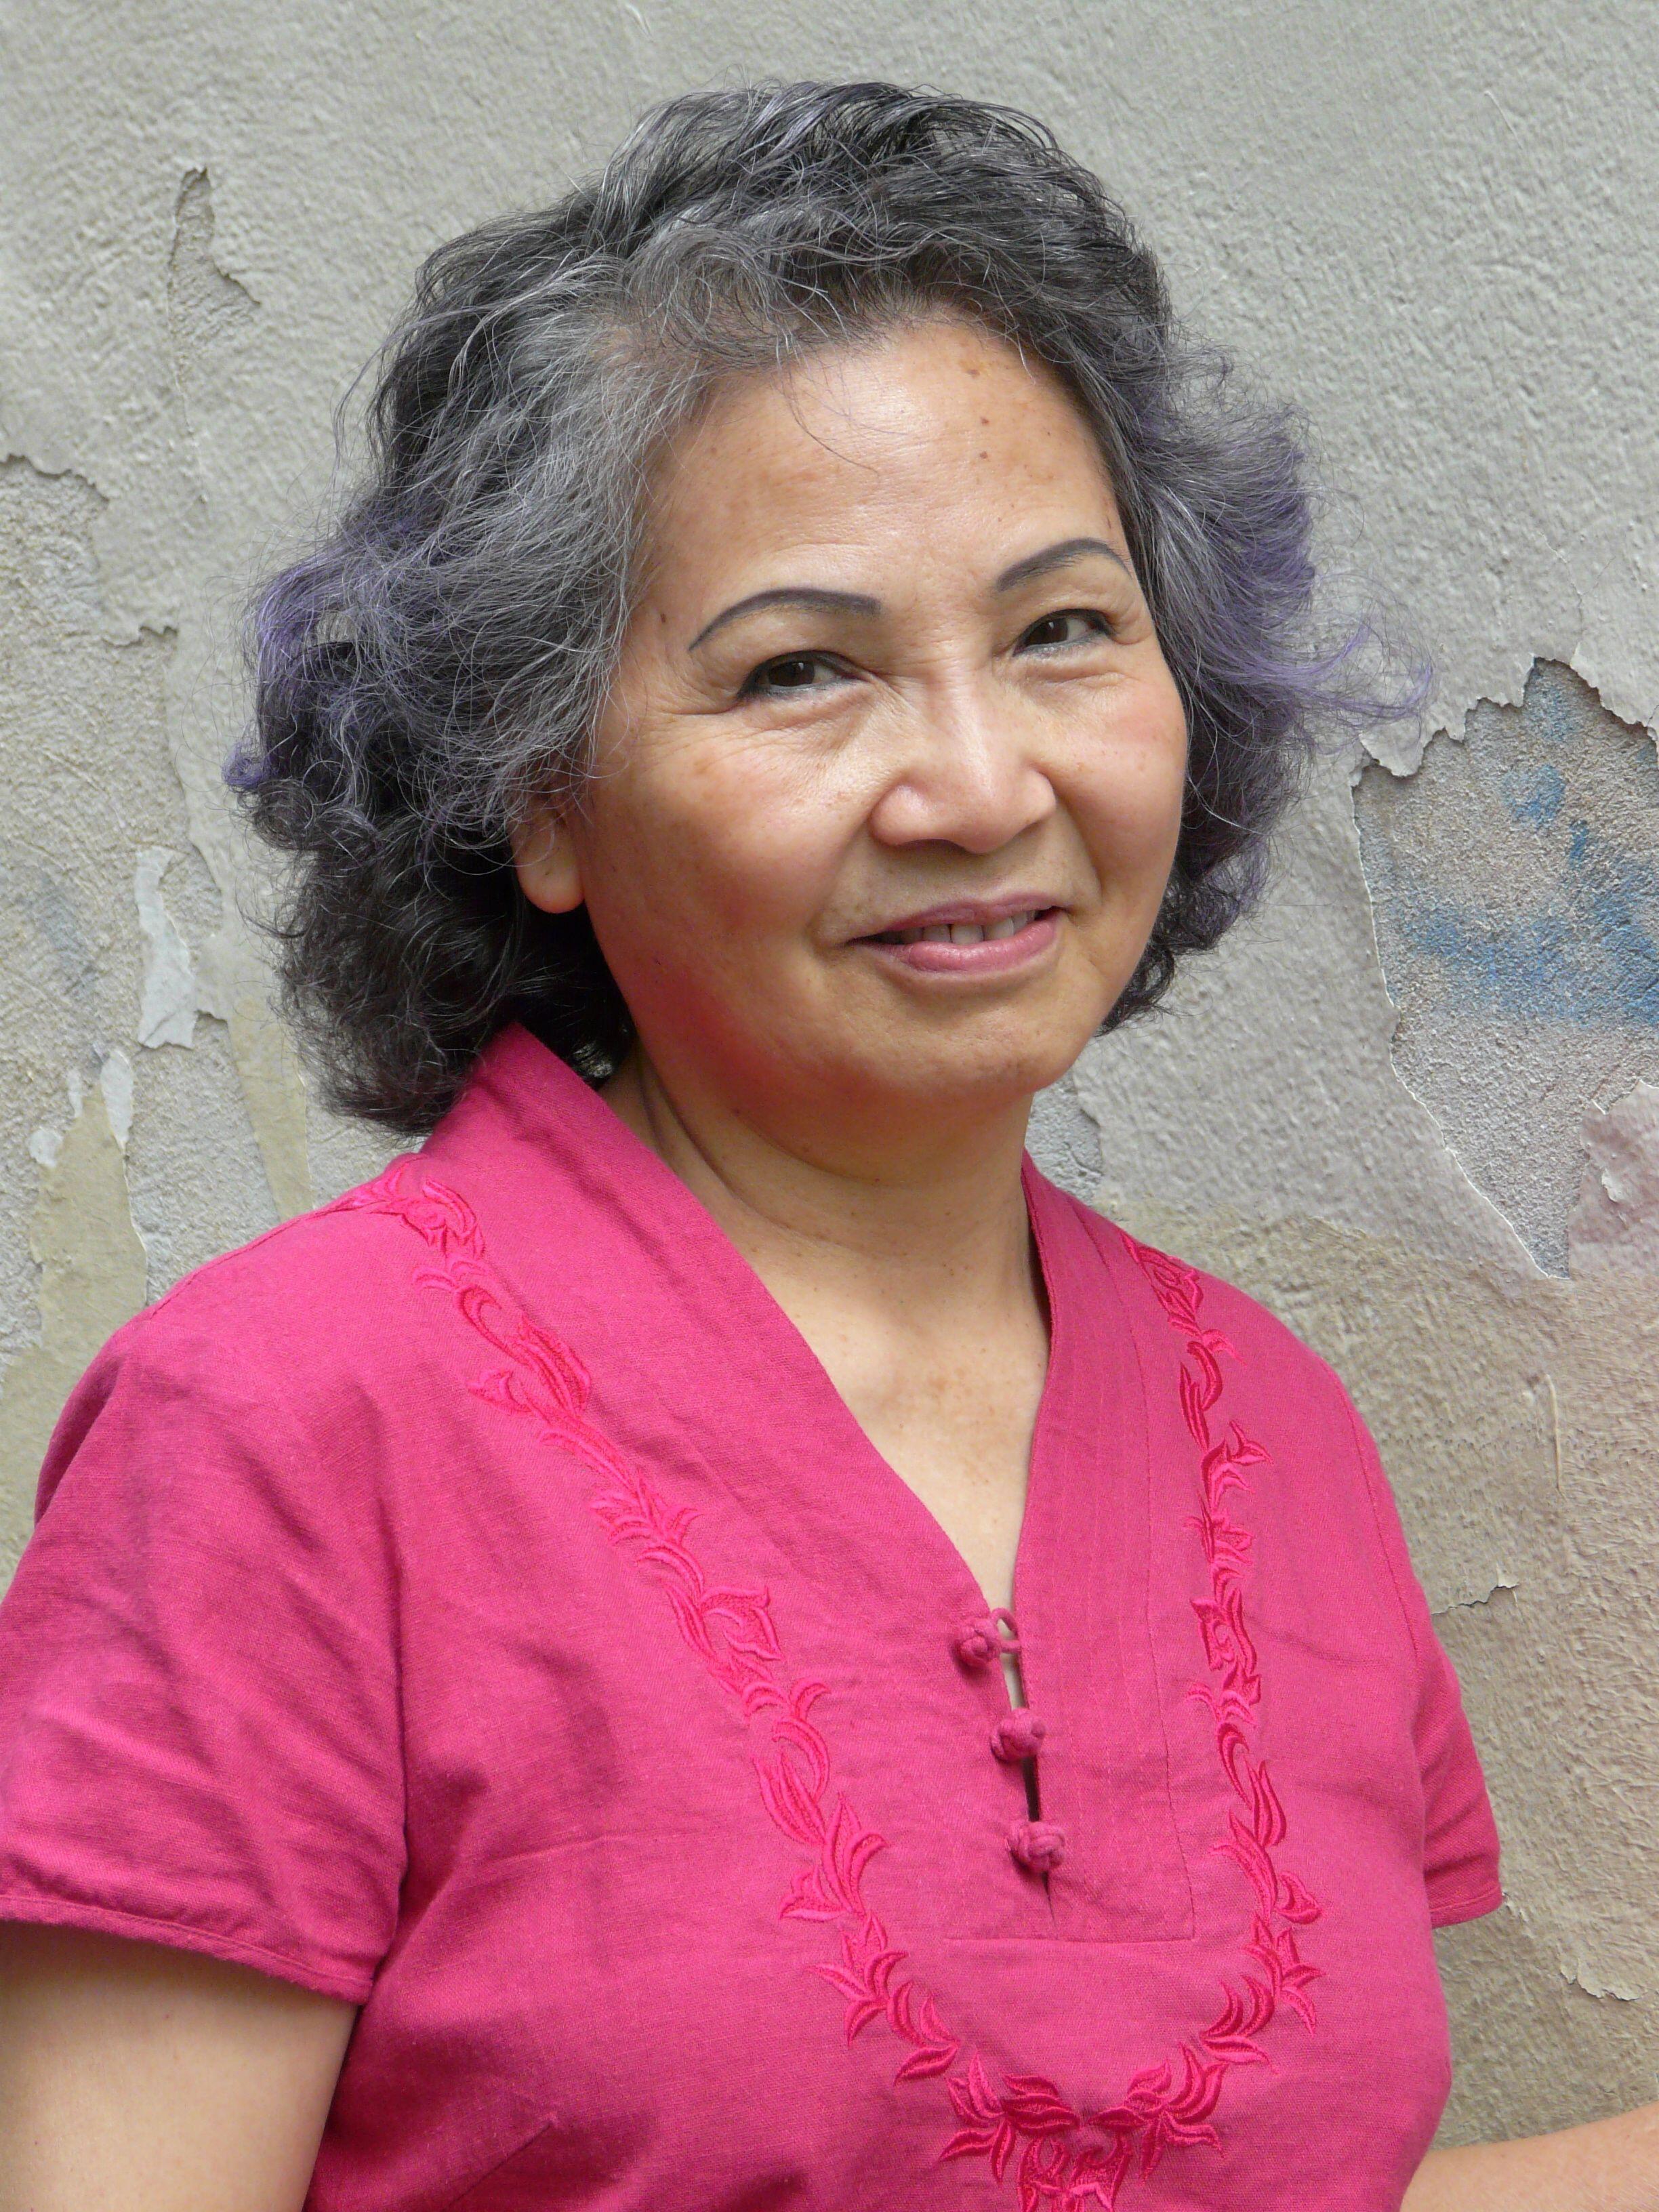 L'écrivaine Duong Thu Huong.